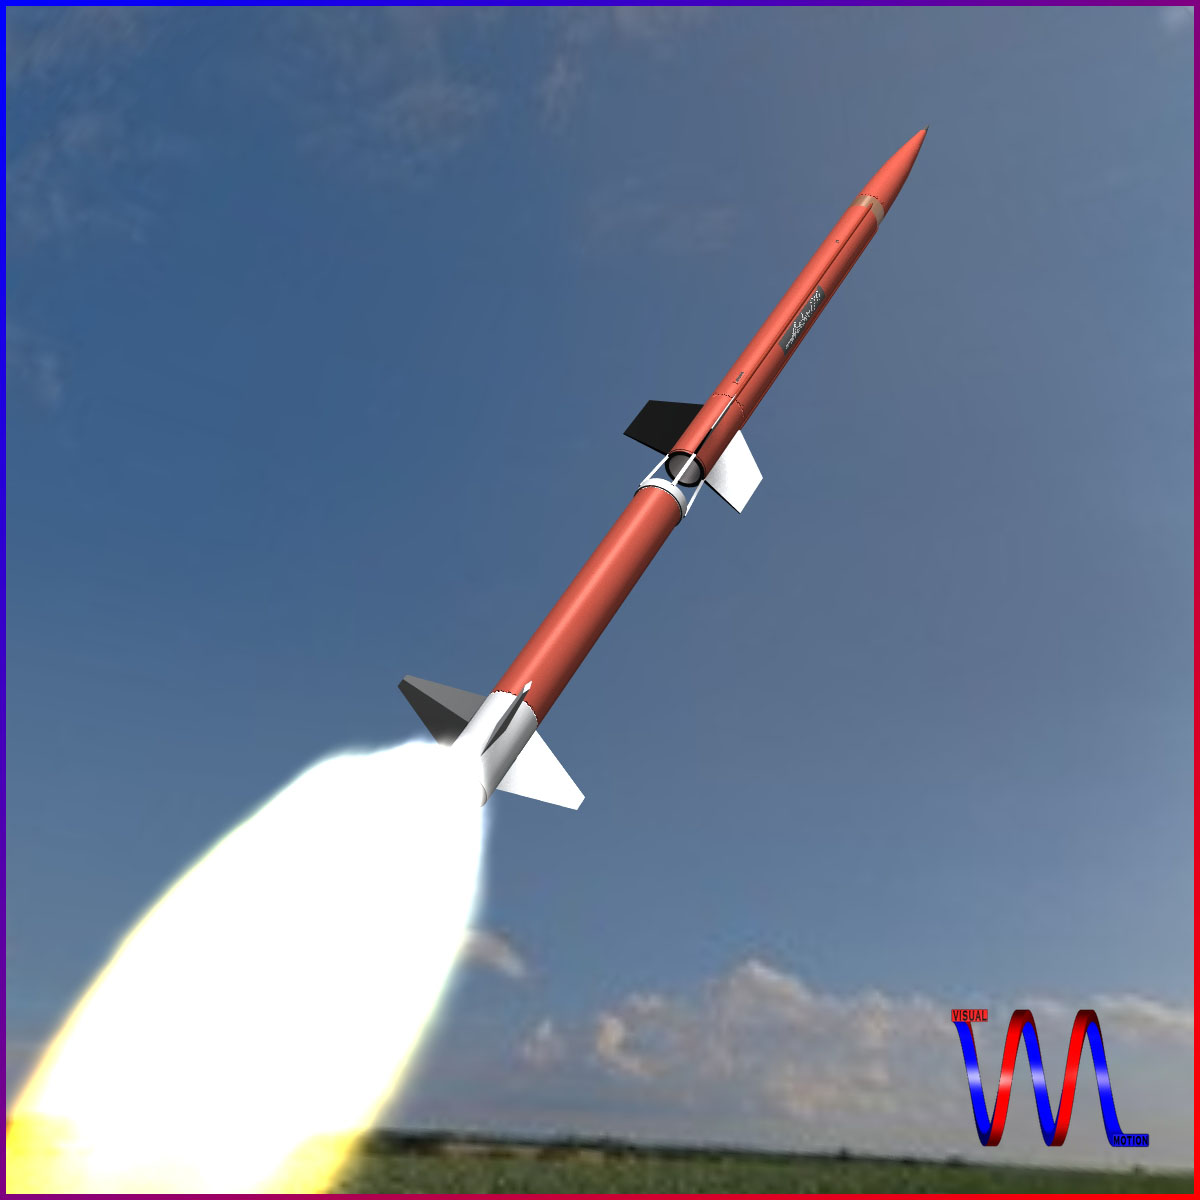 aerobee 170 пуужин 3d загвар 3ds dxf fbx холимог cob dae x obj 166035